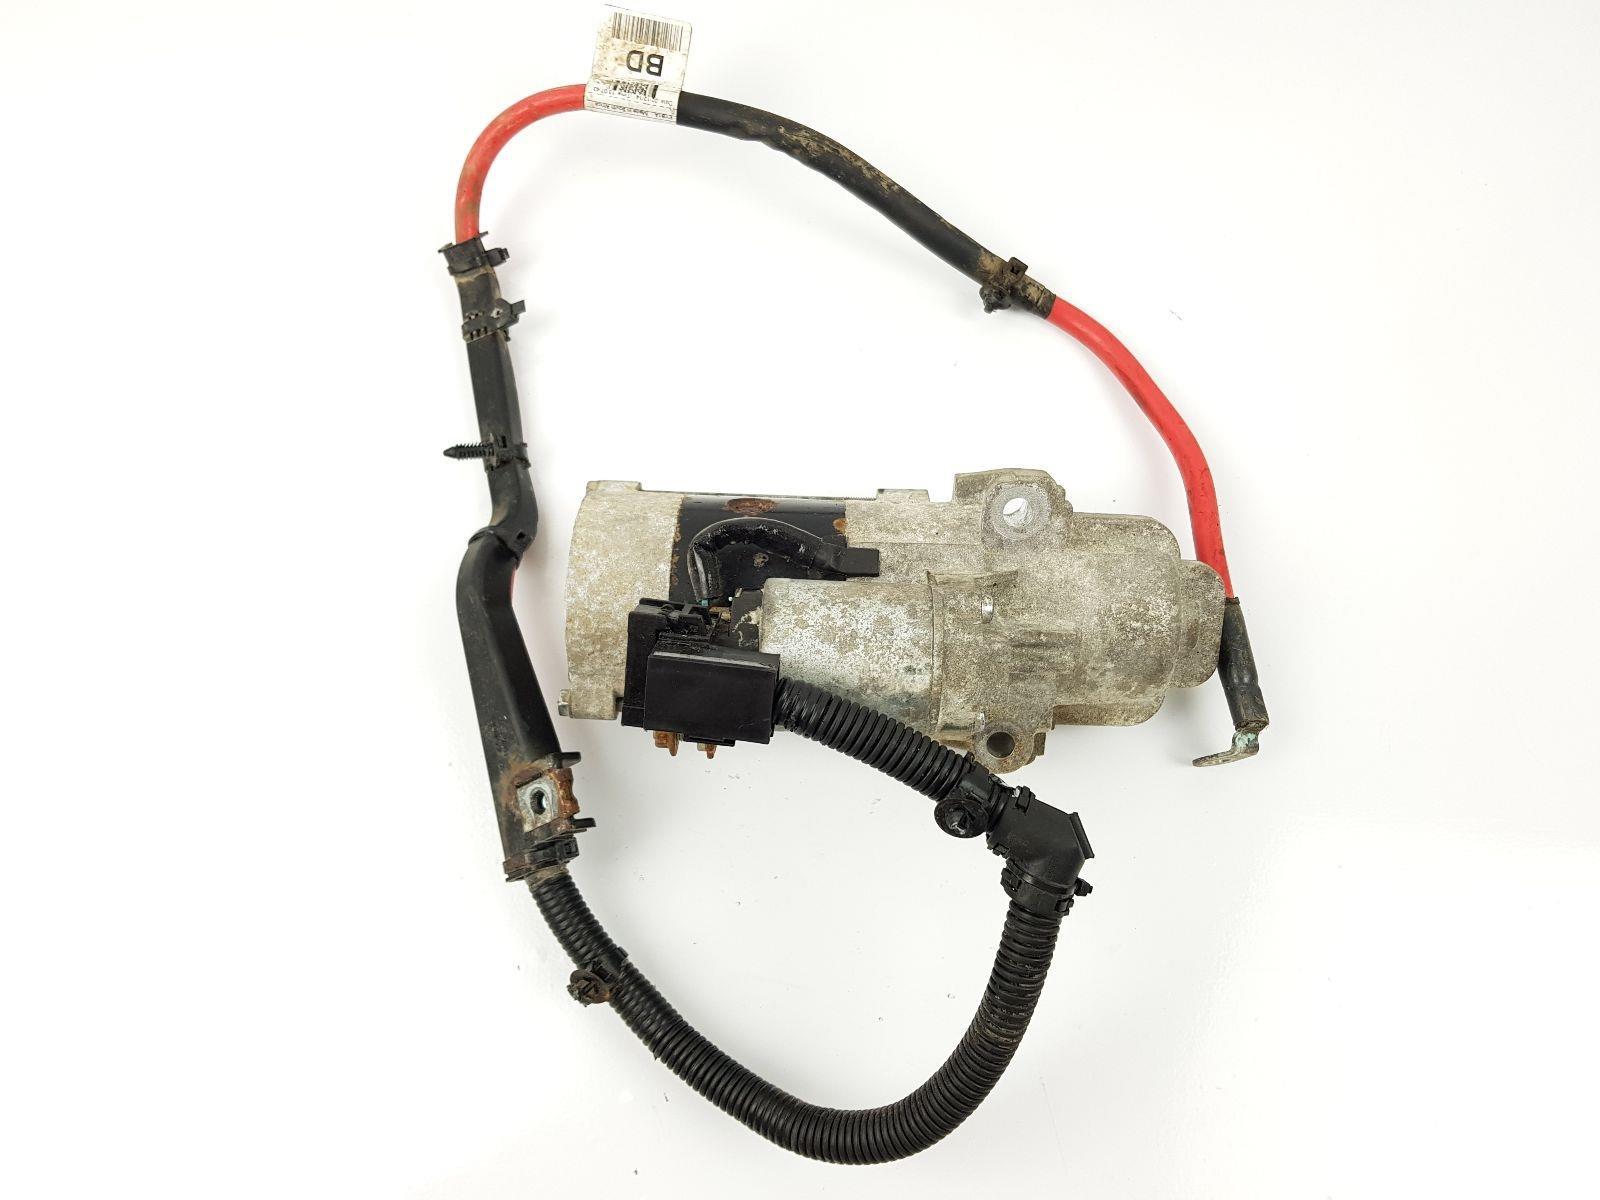 Ford Ranger 2012 To 2015 Starter Motor Diesel Manual For Sale Wiring Selonid Mk3 22 Qj2r Ab3911000aa